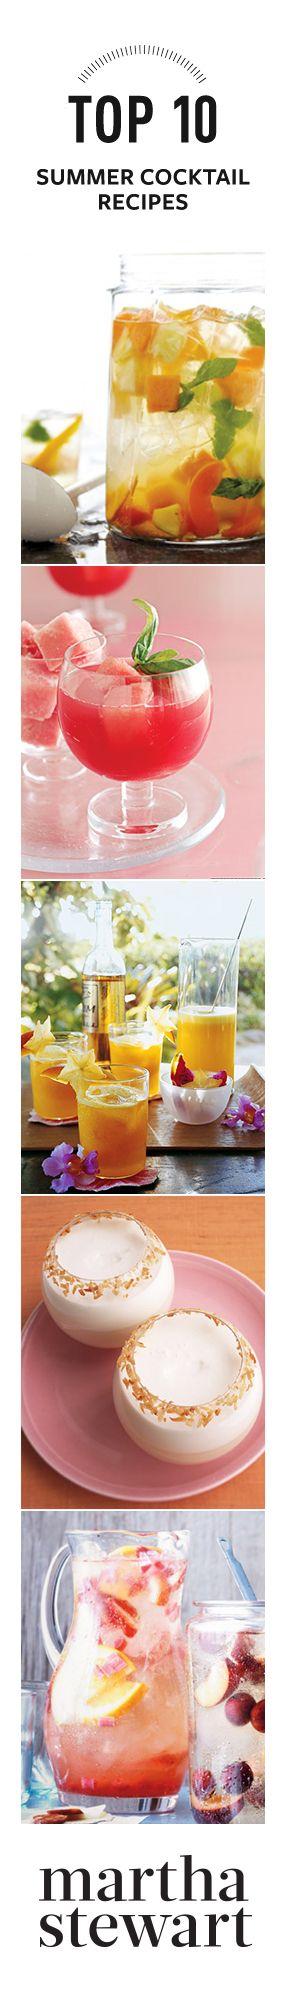 Top 10 Summer Cocktail Recipes from Martha Stewart